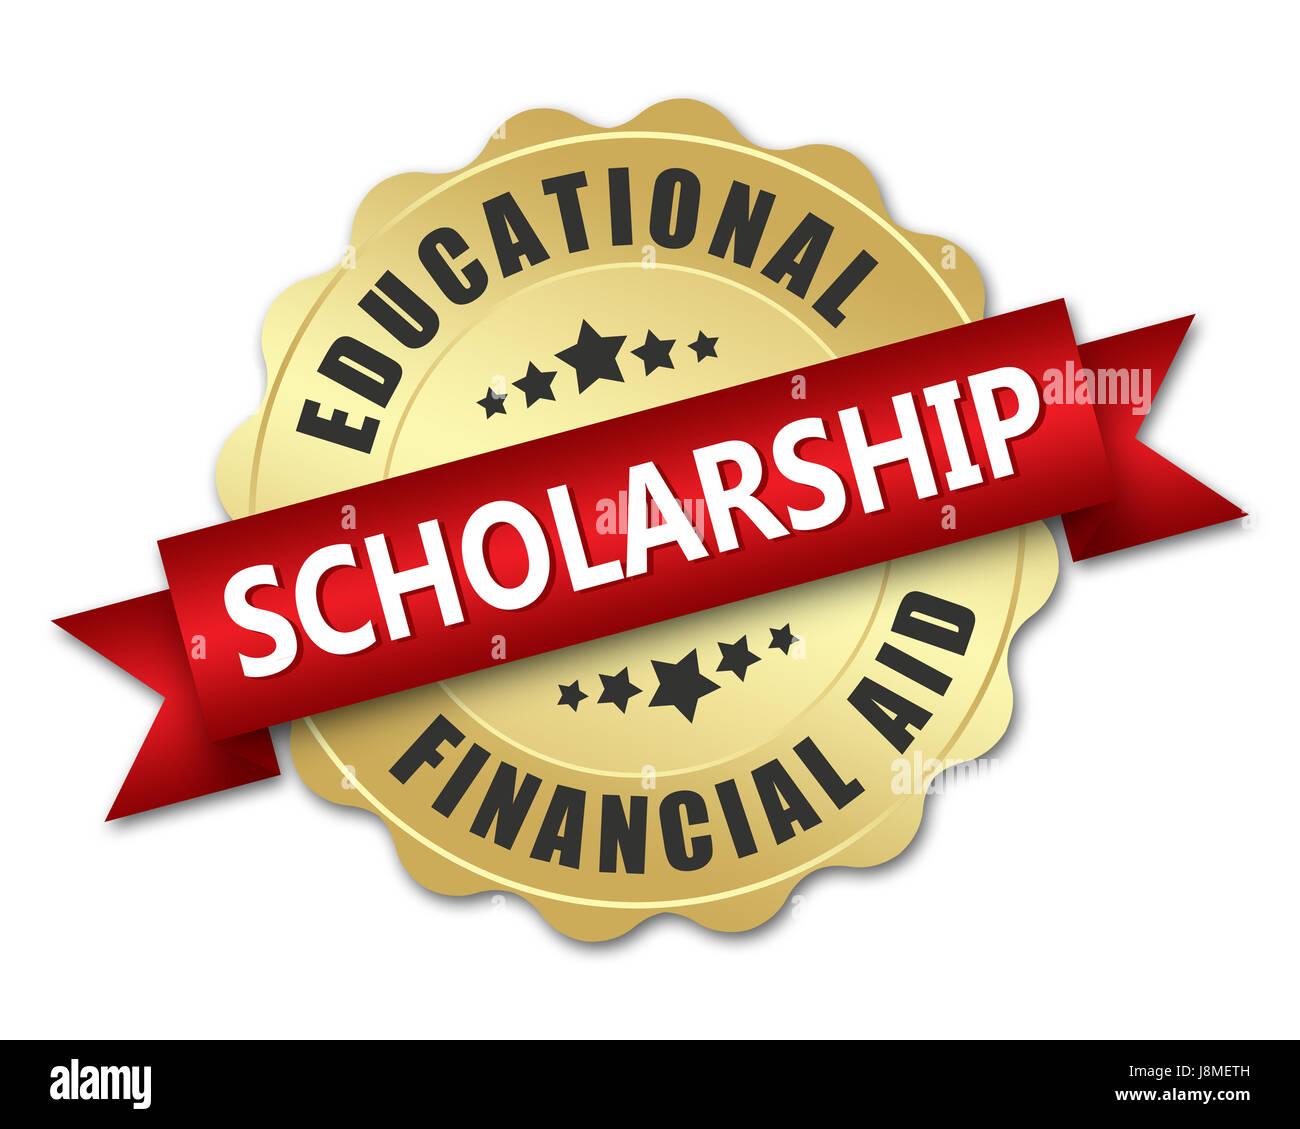 Scholarship golden badge - Stock Image